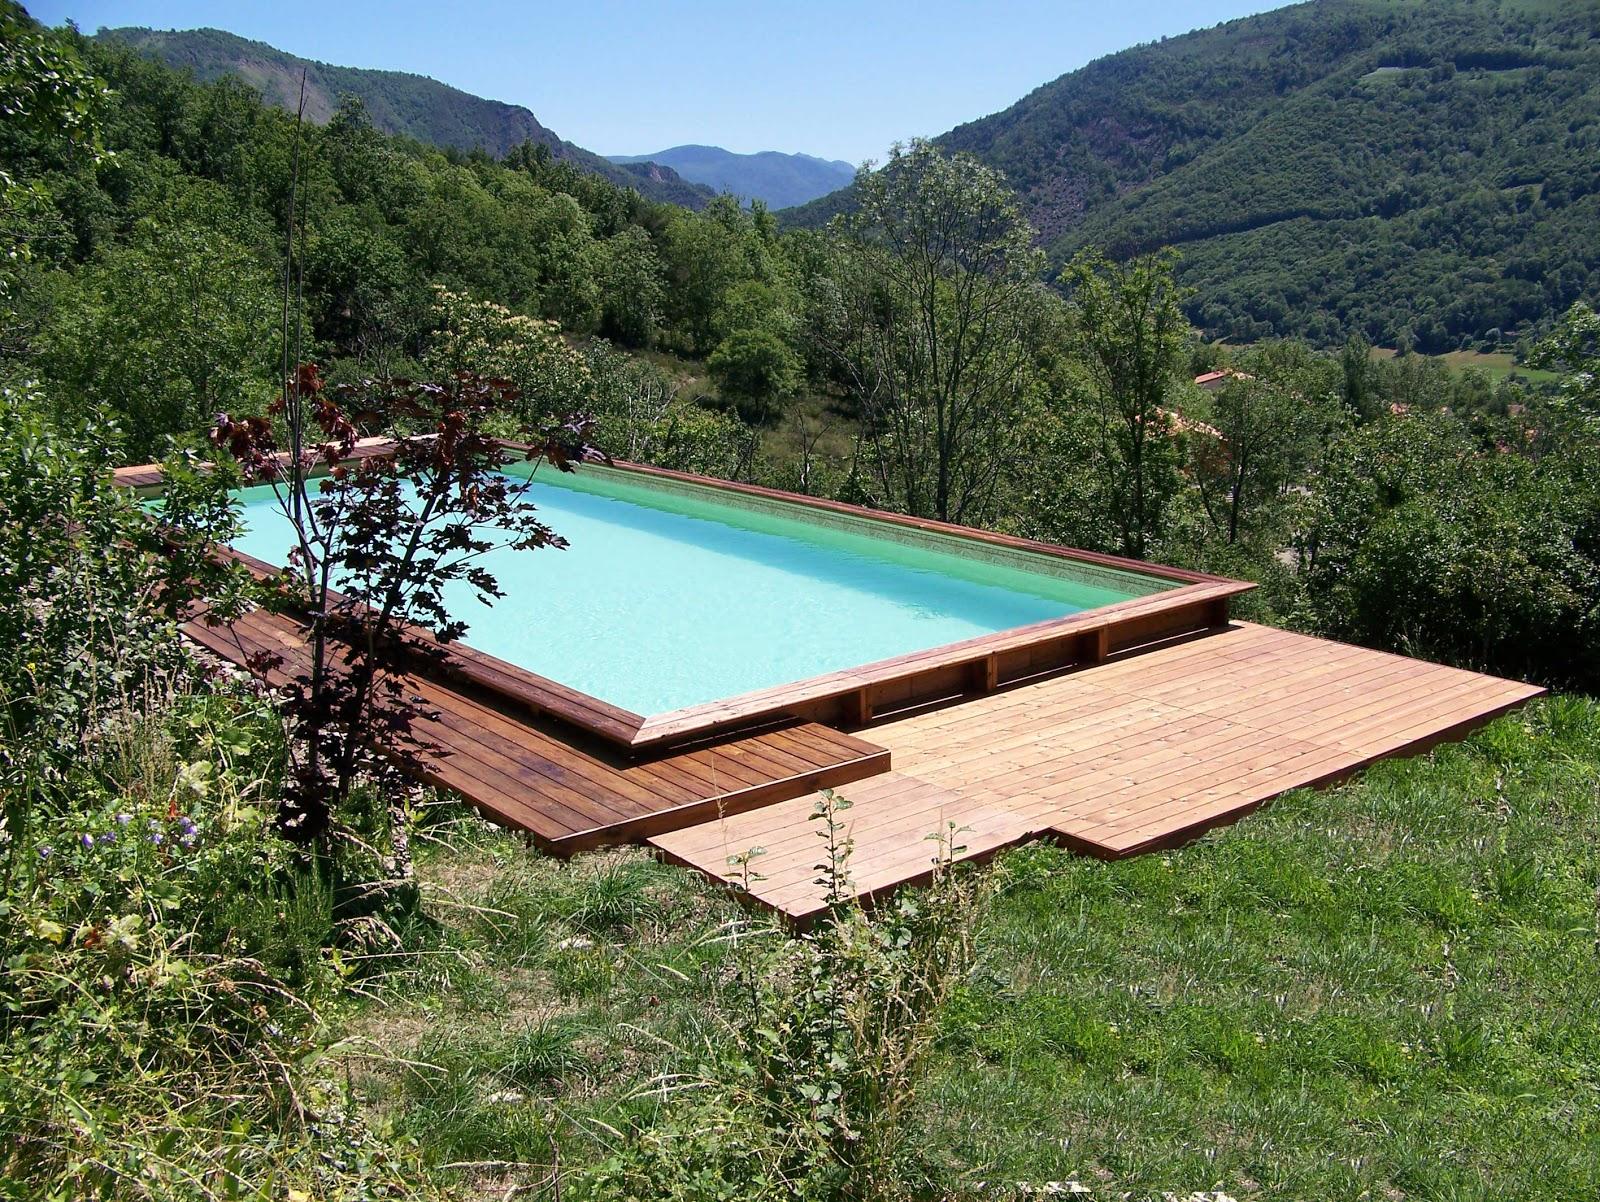 piscine carre bois piscine hors sol bois weva carr e. Black Bedroom Furniture Sets. Home Design Ideas